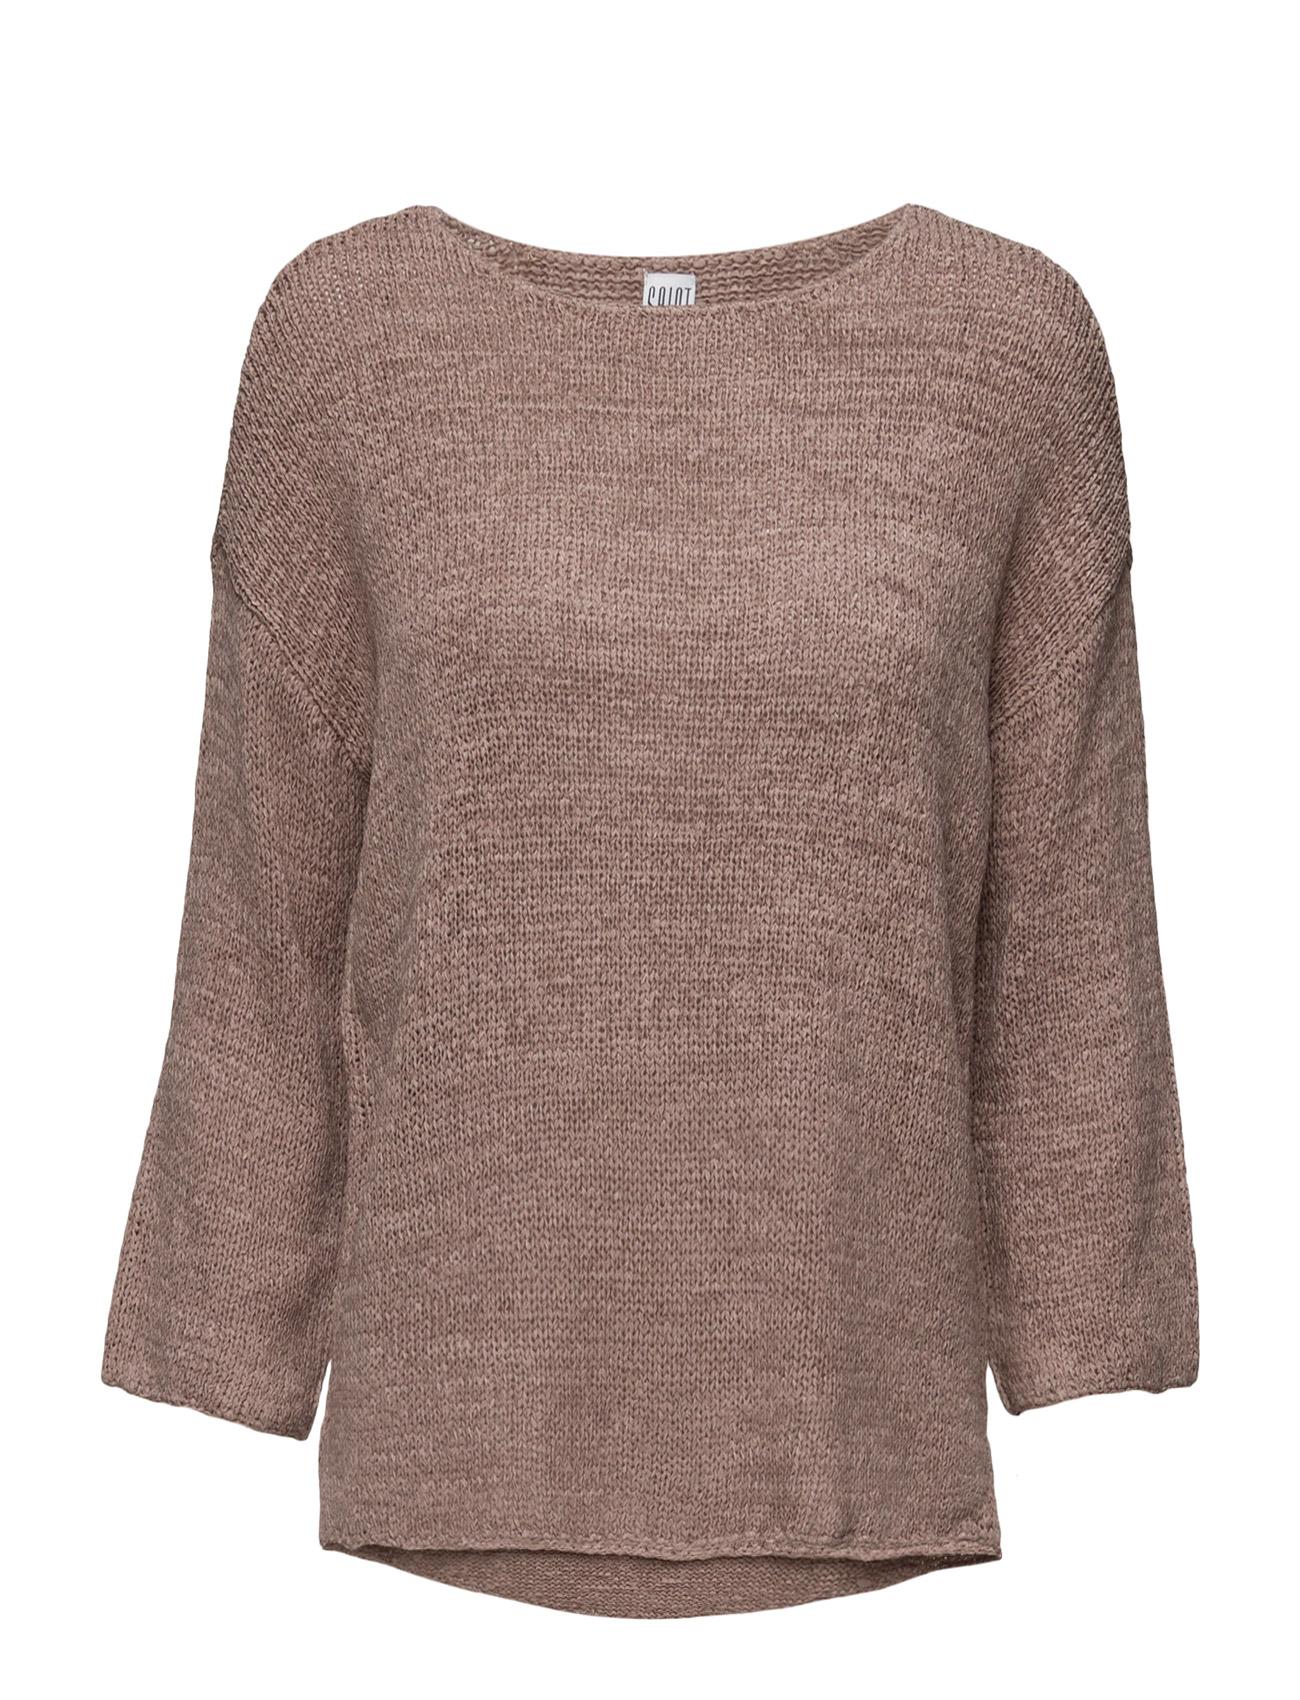 Tape Yarn Sweater Saint Tropez Sweatshirts til Damer i